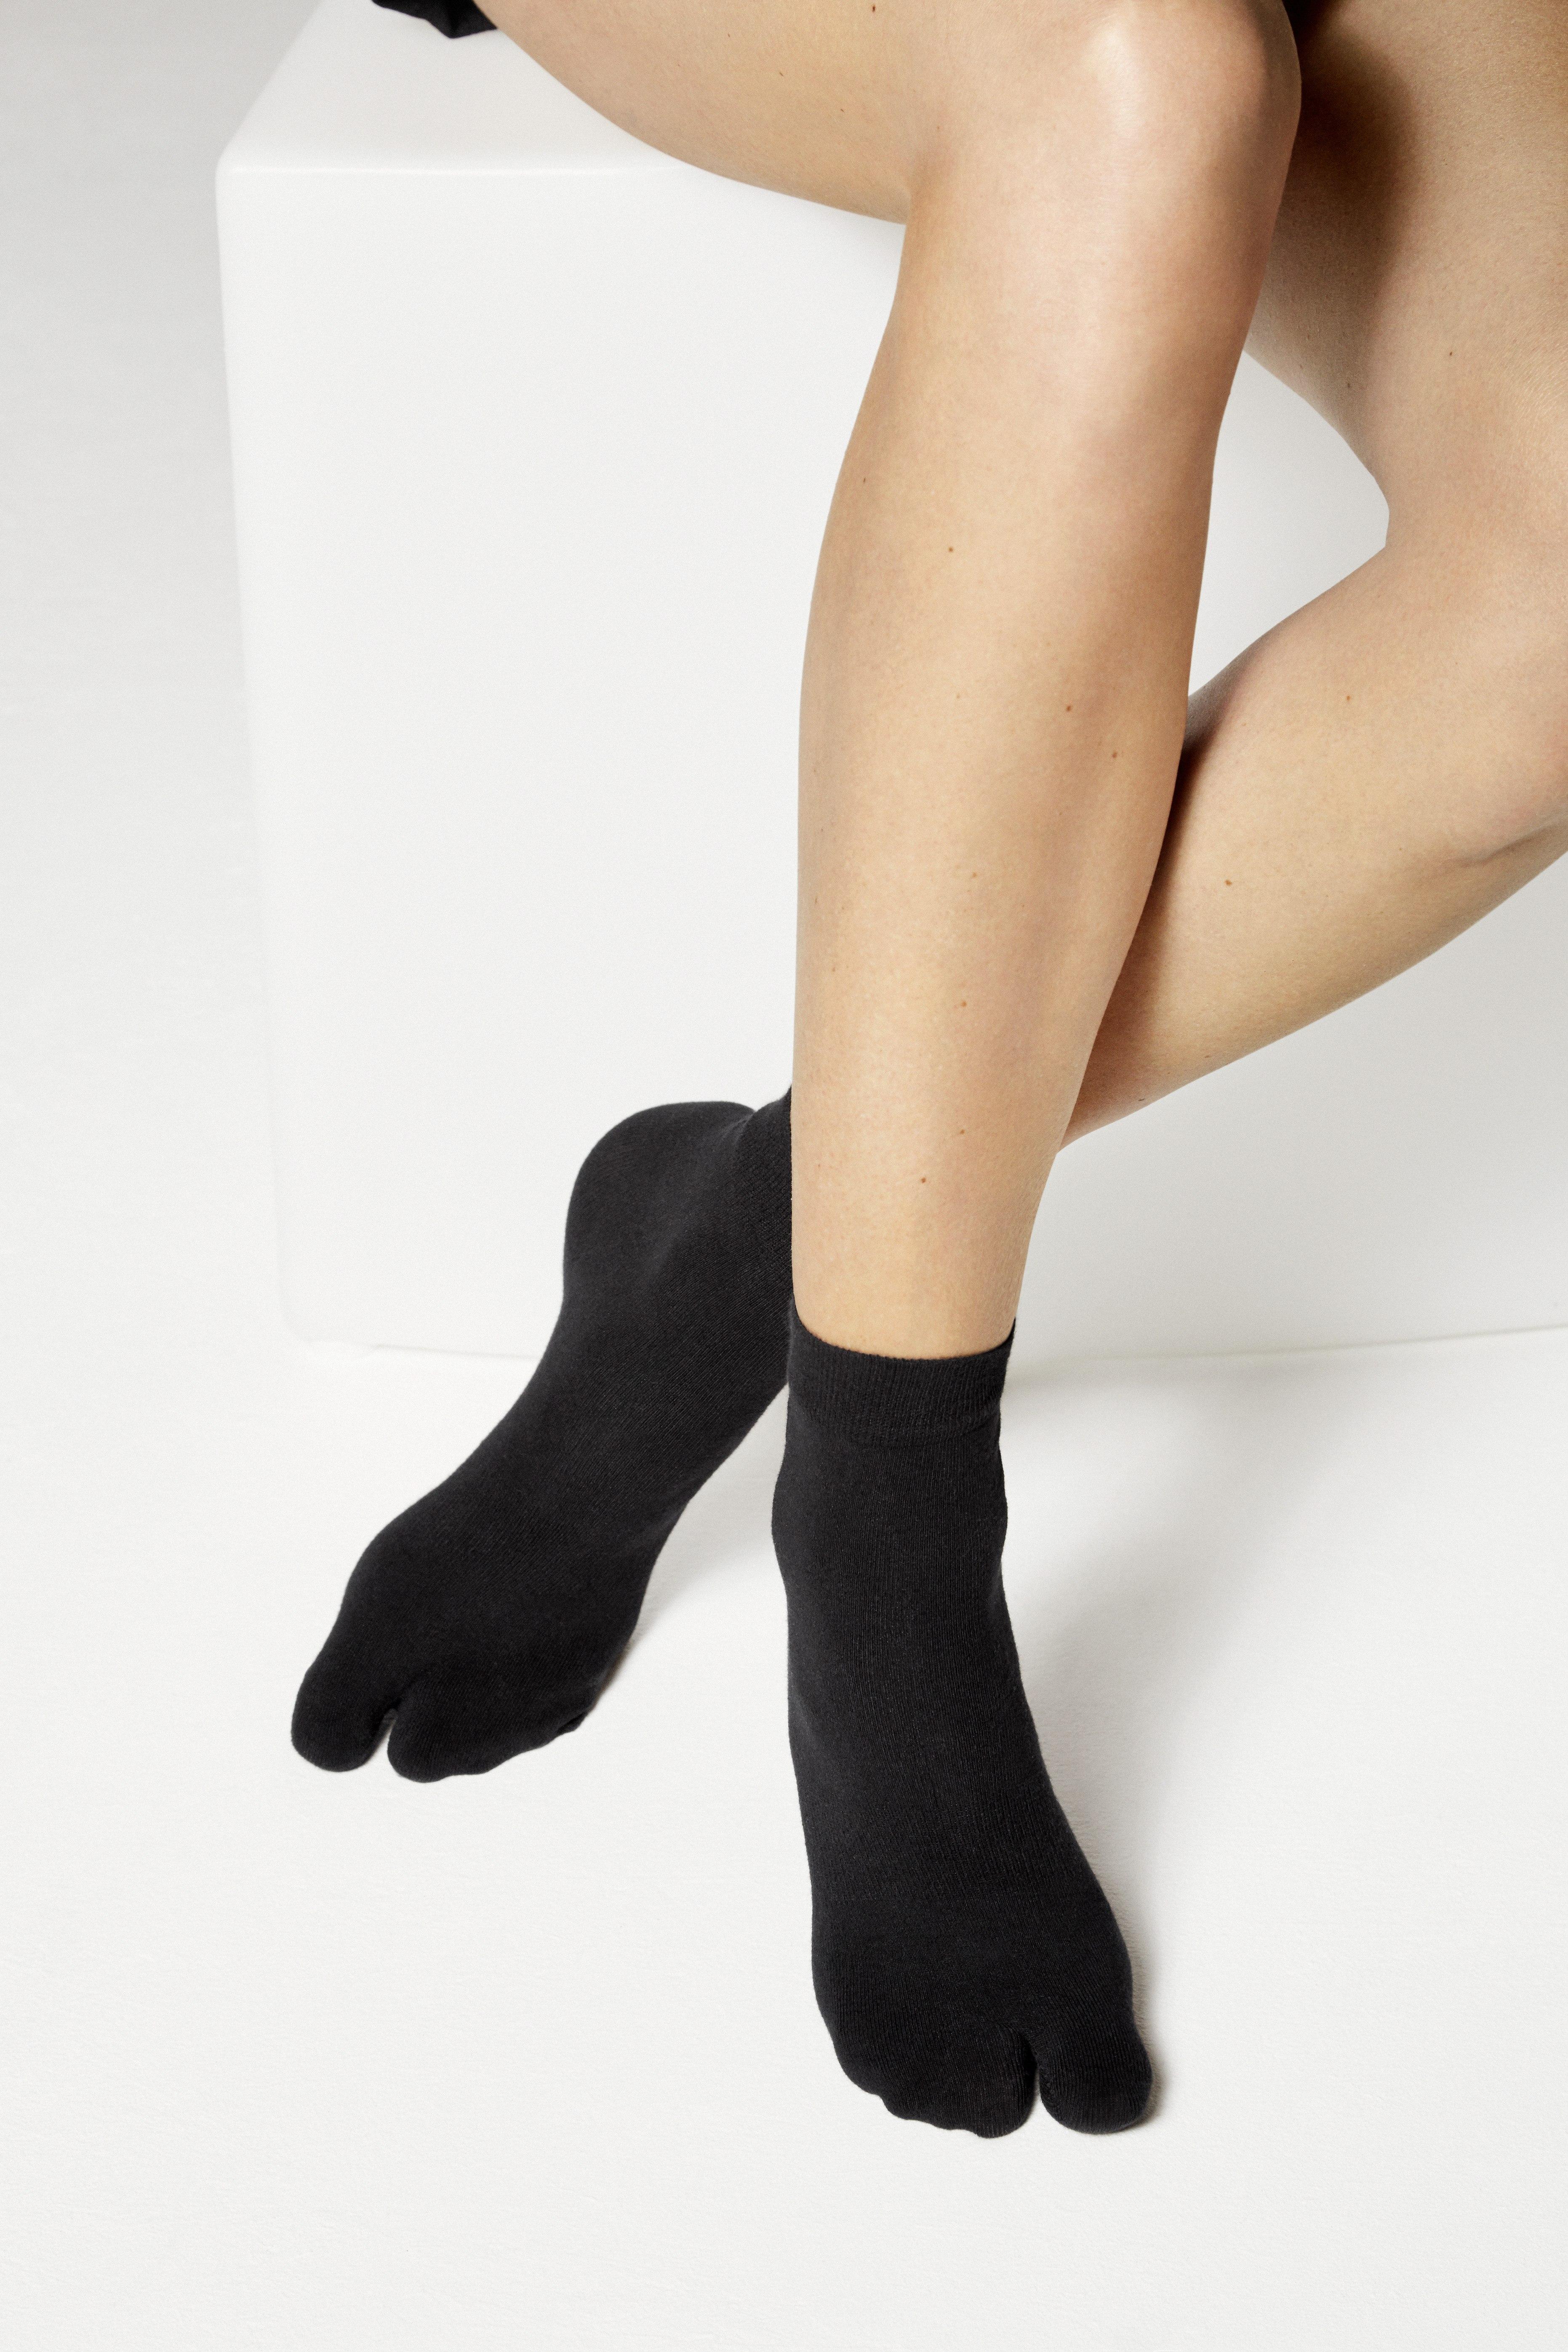 Birkenstock Damen Zehentrenner Socken Cotton Sole Split Schwarz